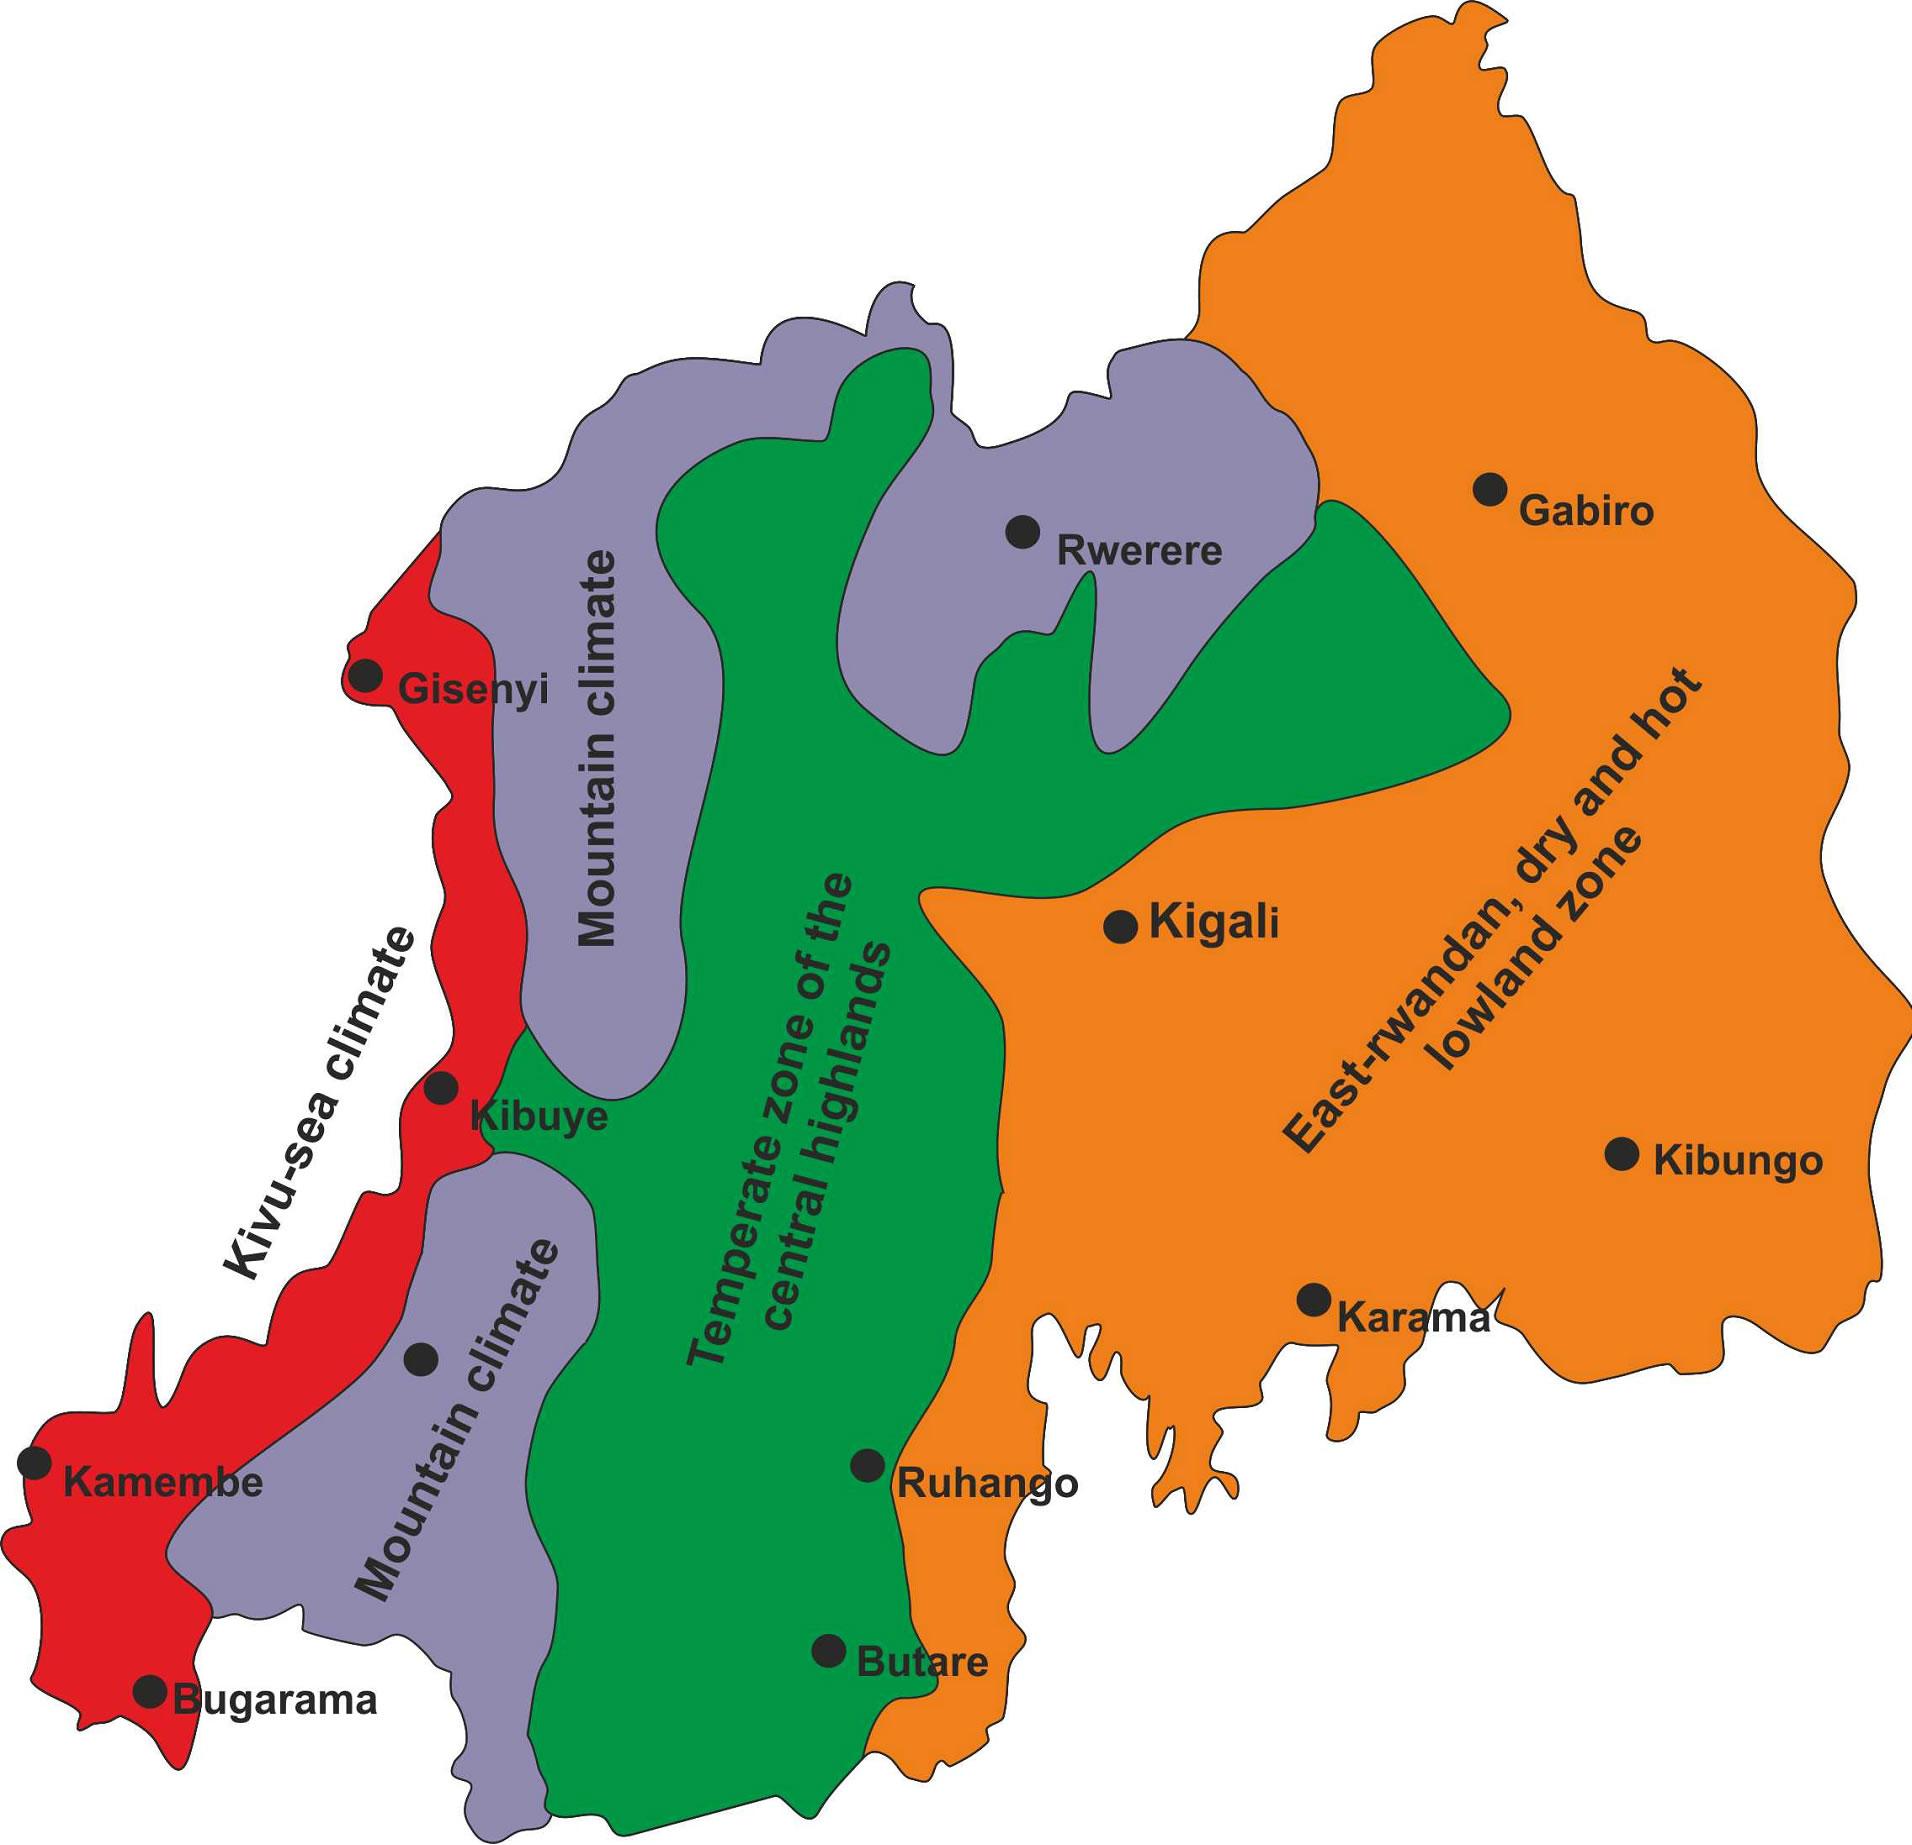 Does the global warming modify the local Rwandan climate?